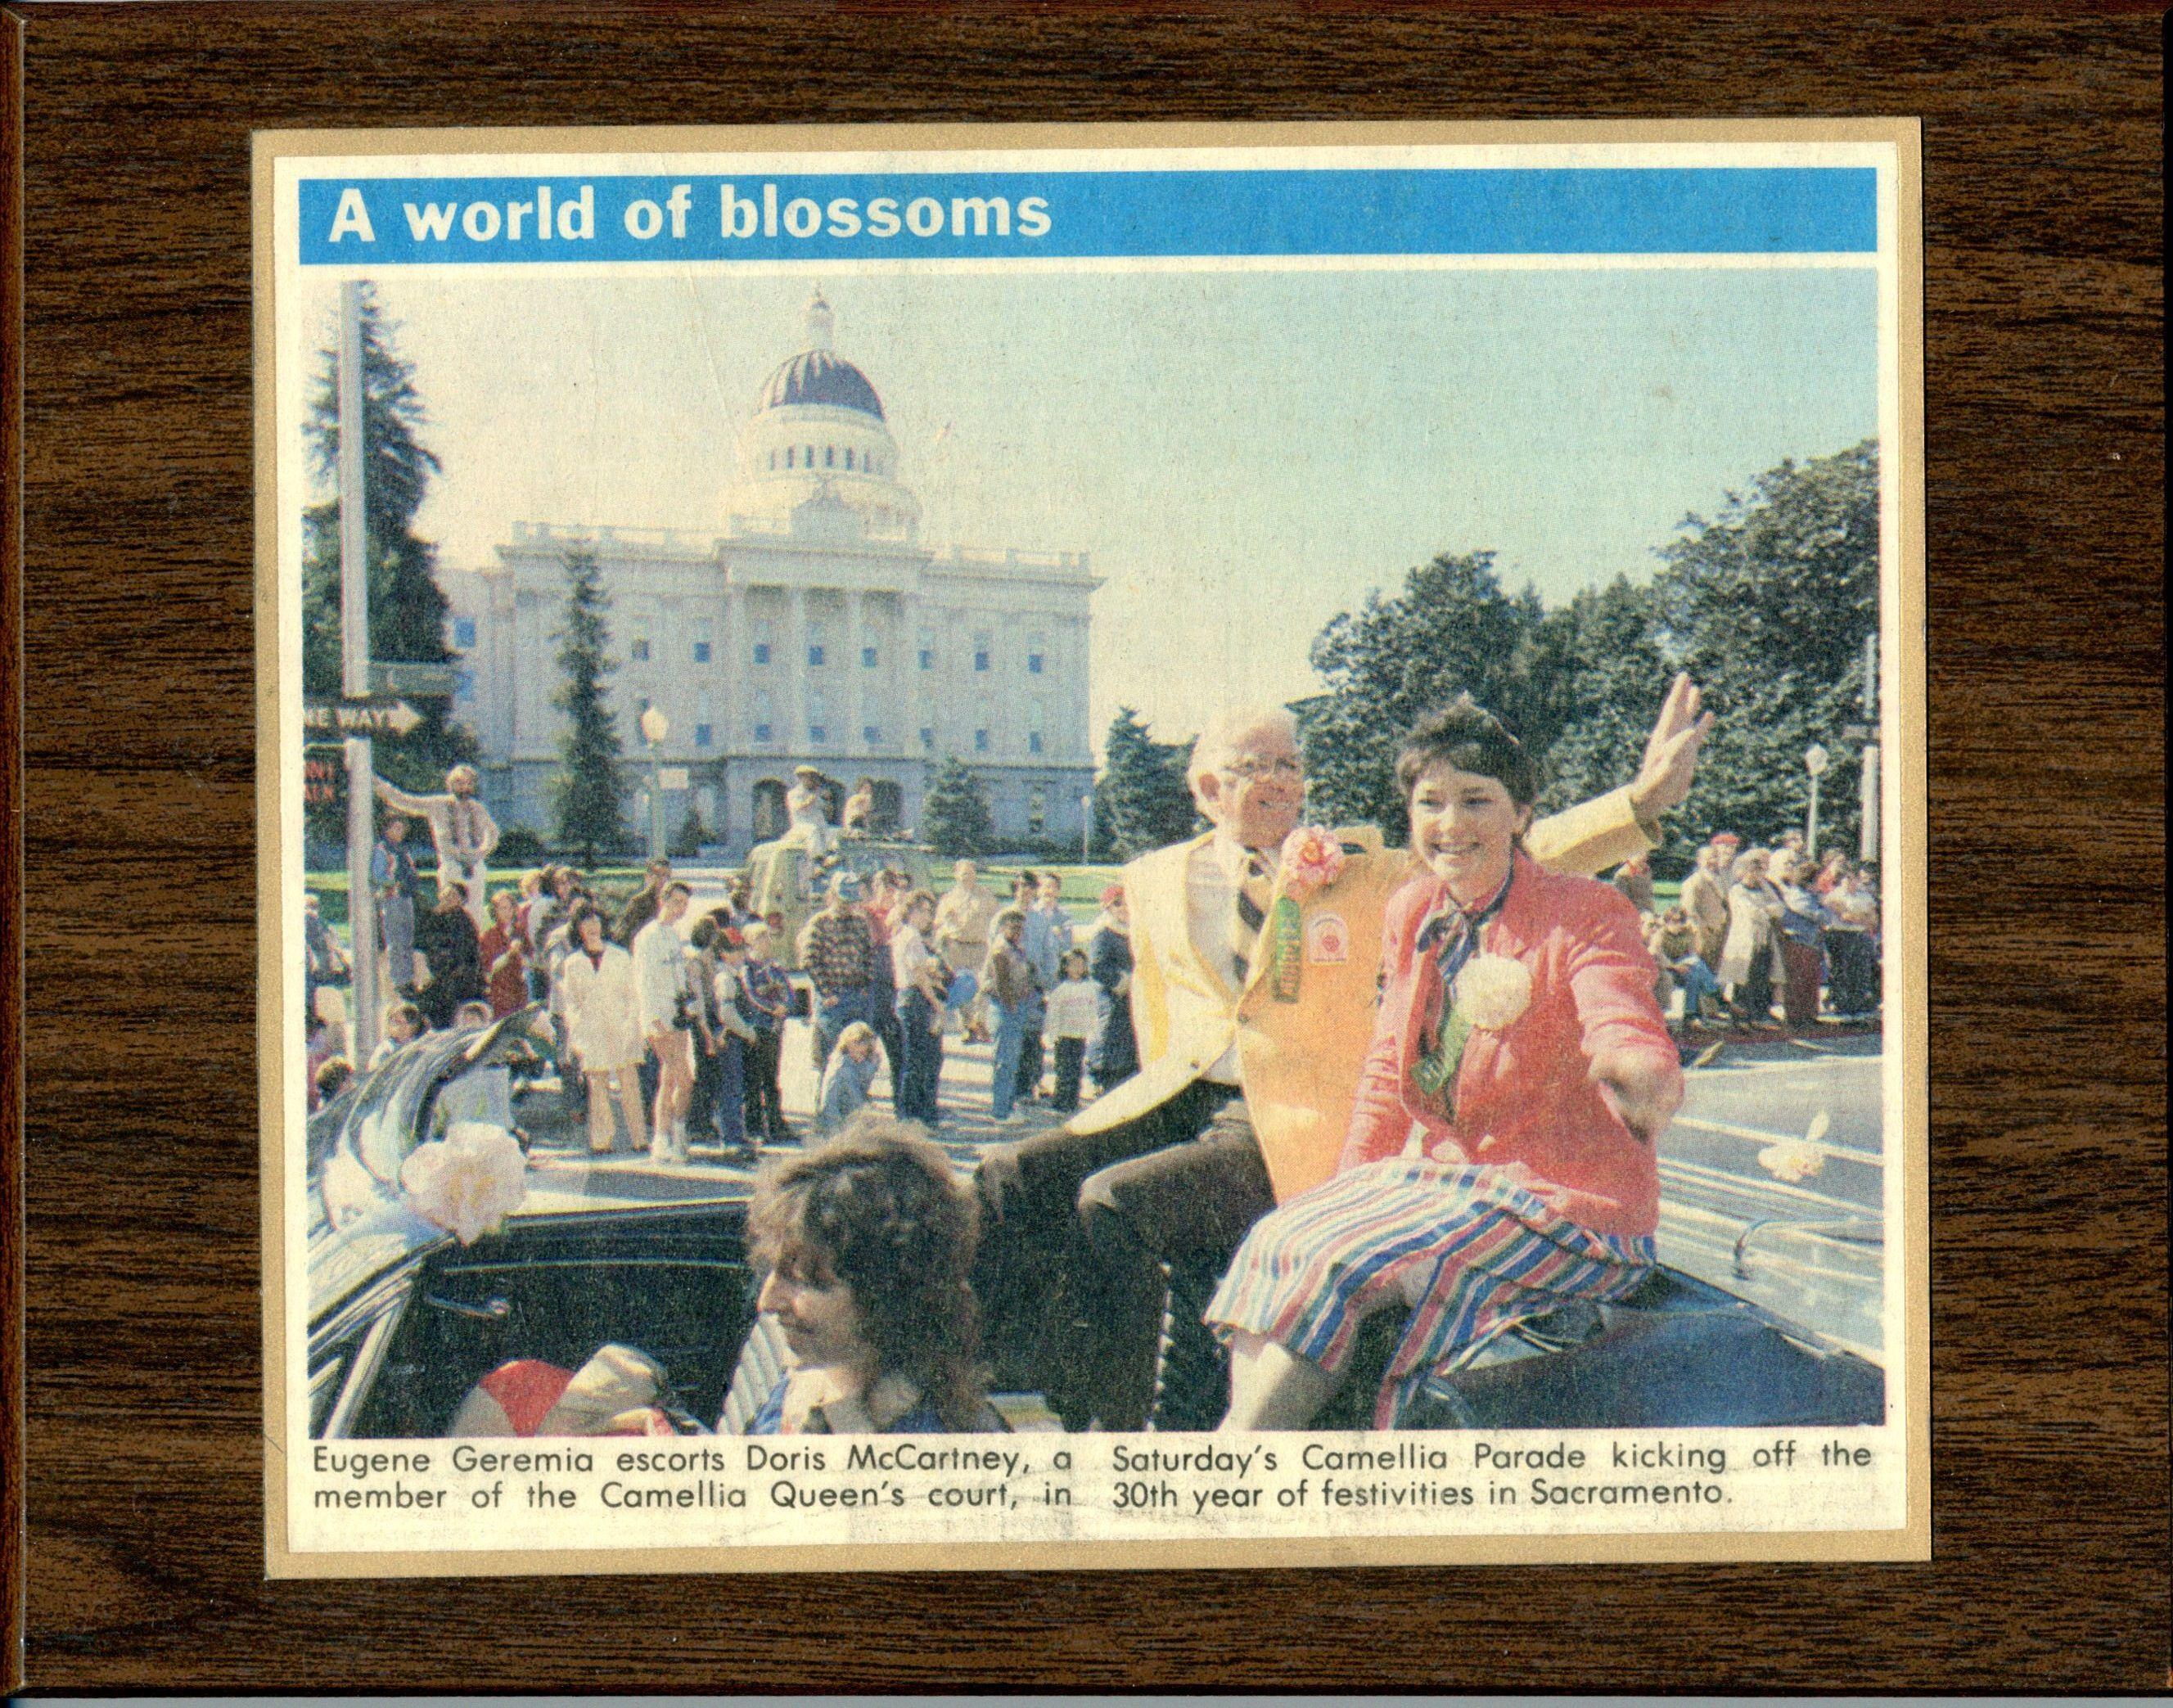 A photo from the camelia parade in sacramento 1985